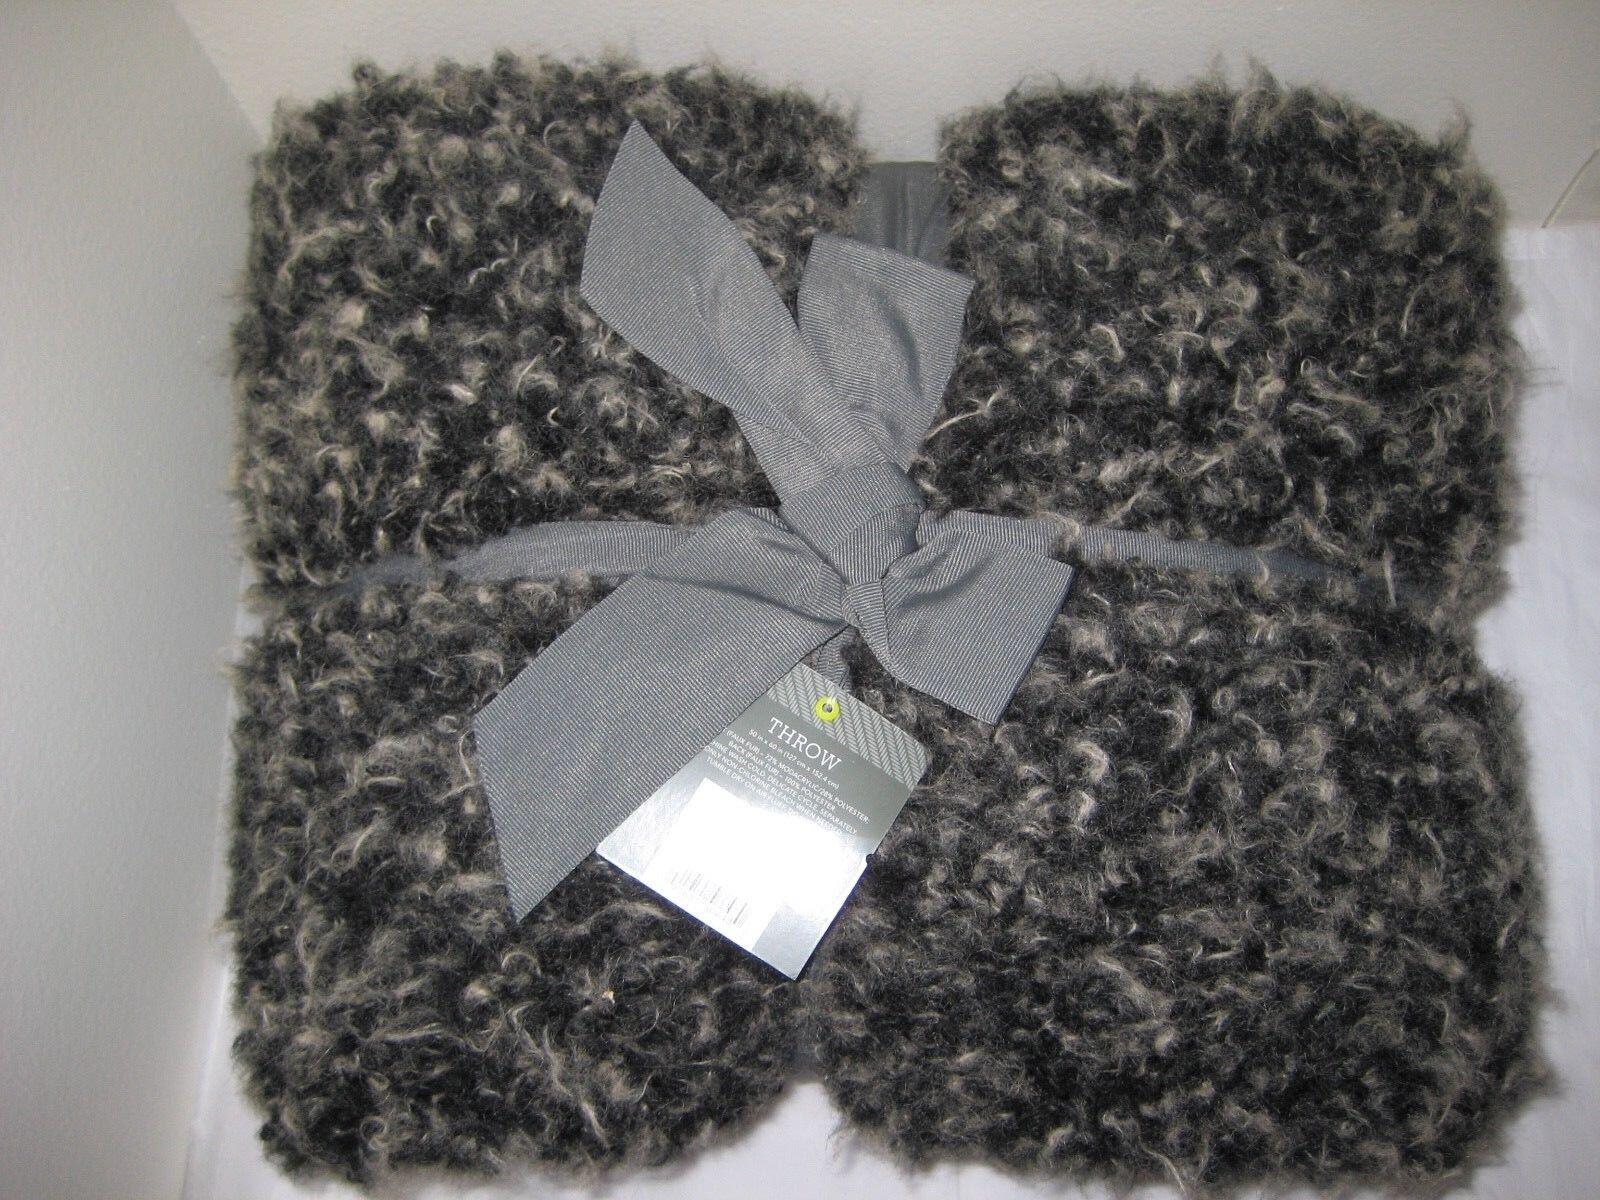 NEW Threshold Faux Fur Throw Blanket - Size  50 x60